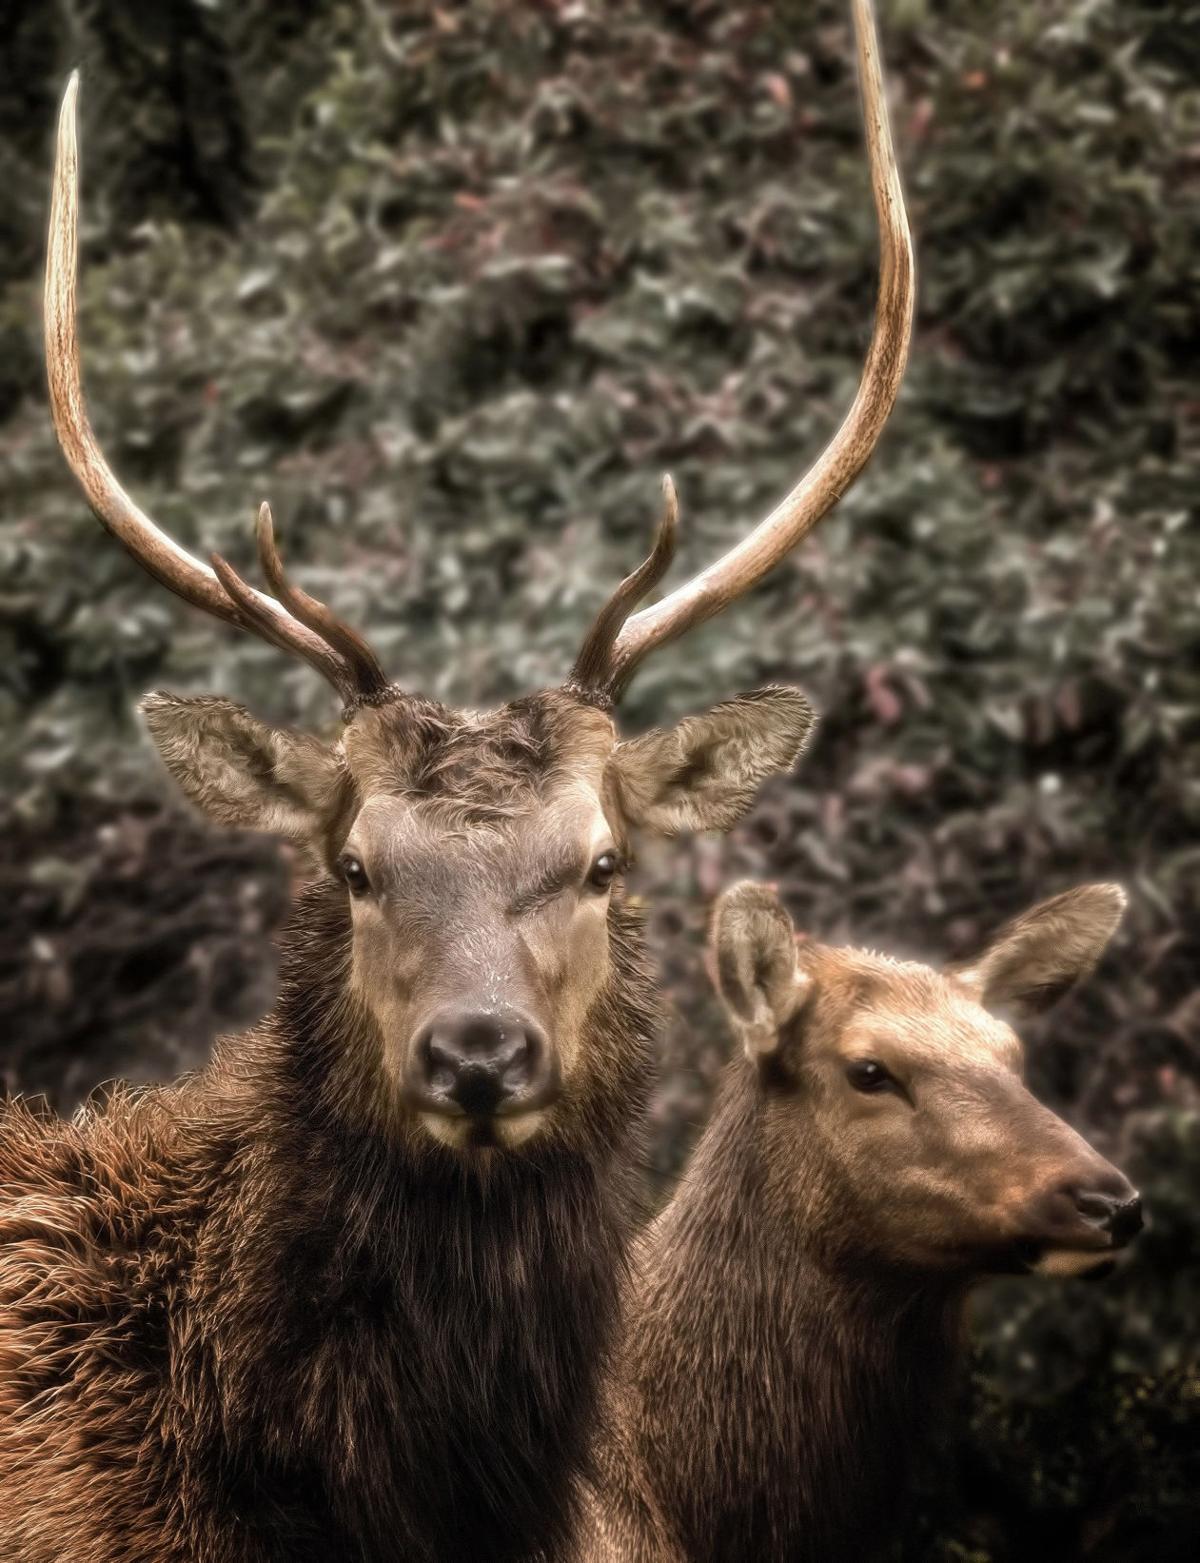 Elk culling an option for public safety